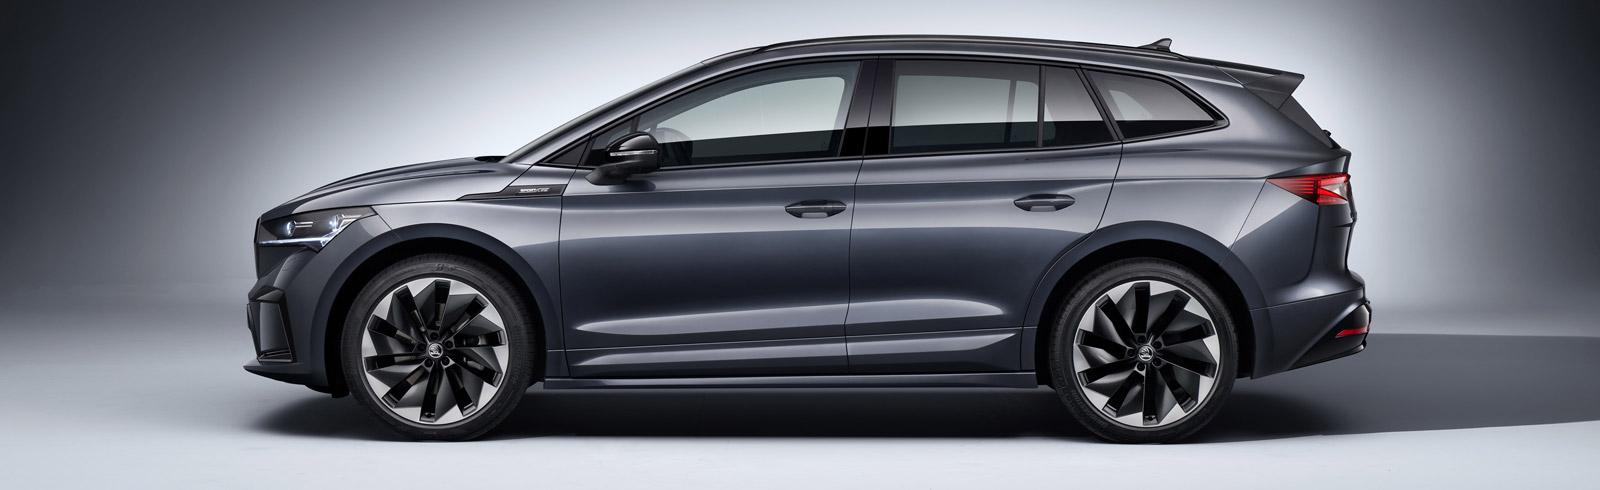 The Škoda Enyaq Sportline iV goes official